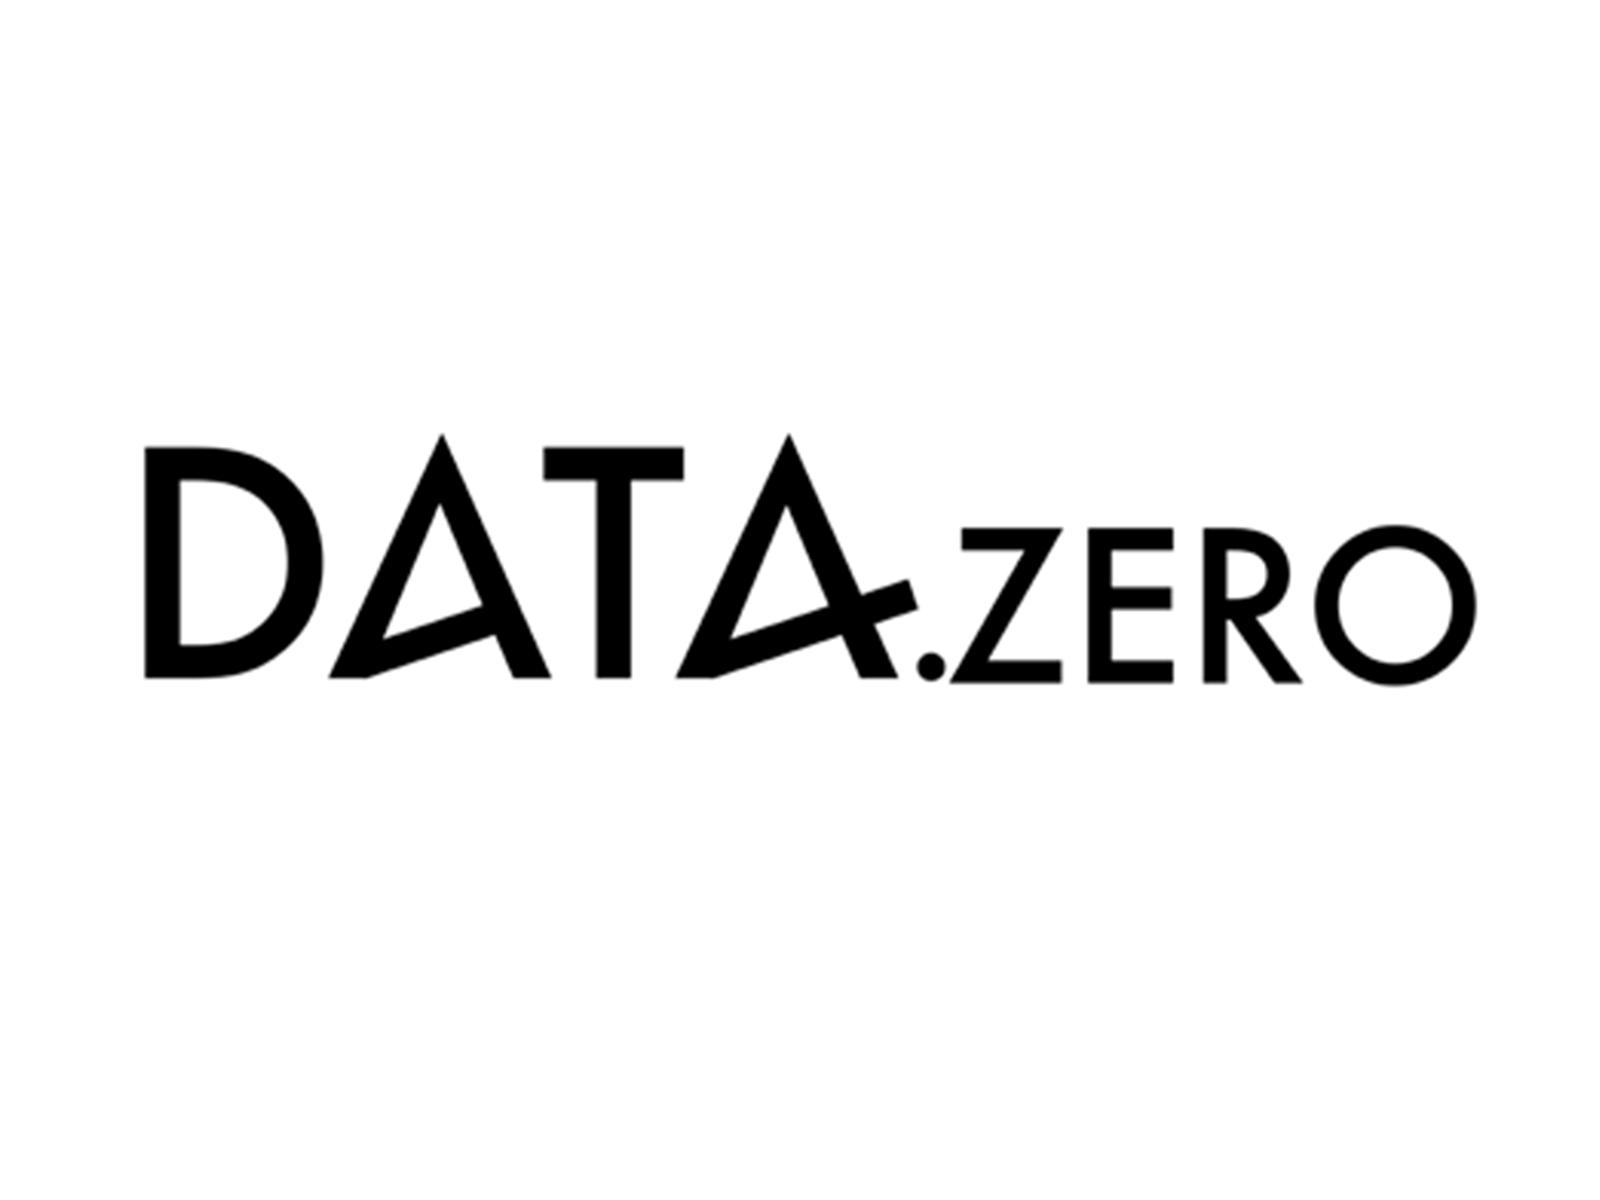 datazero-logo